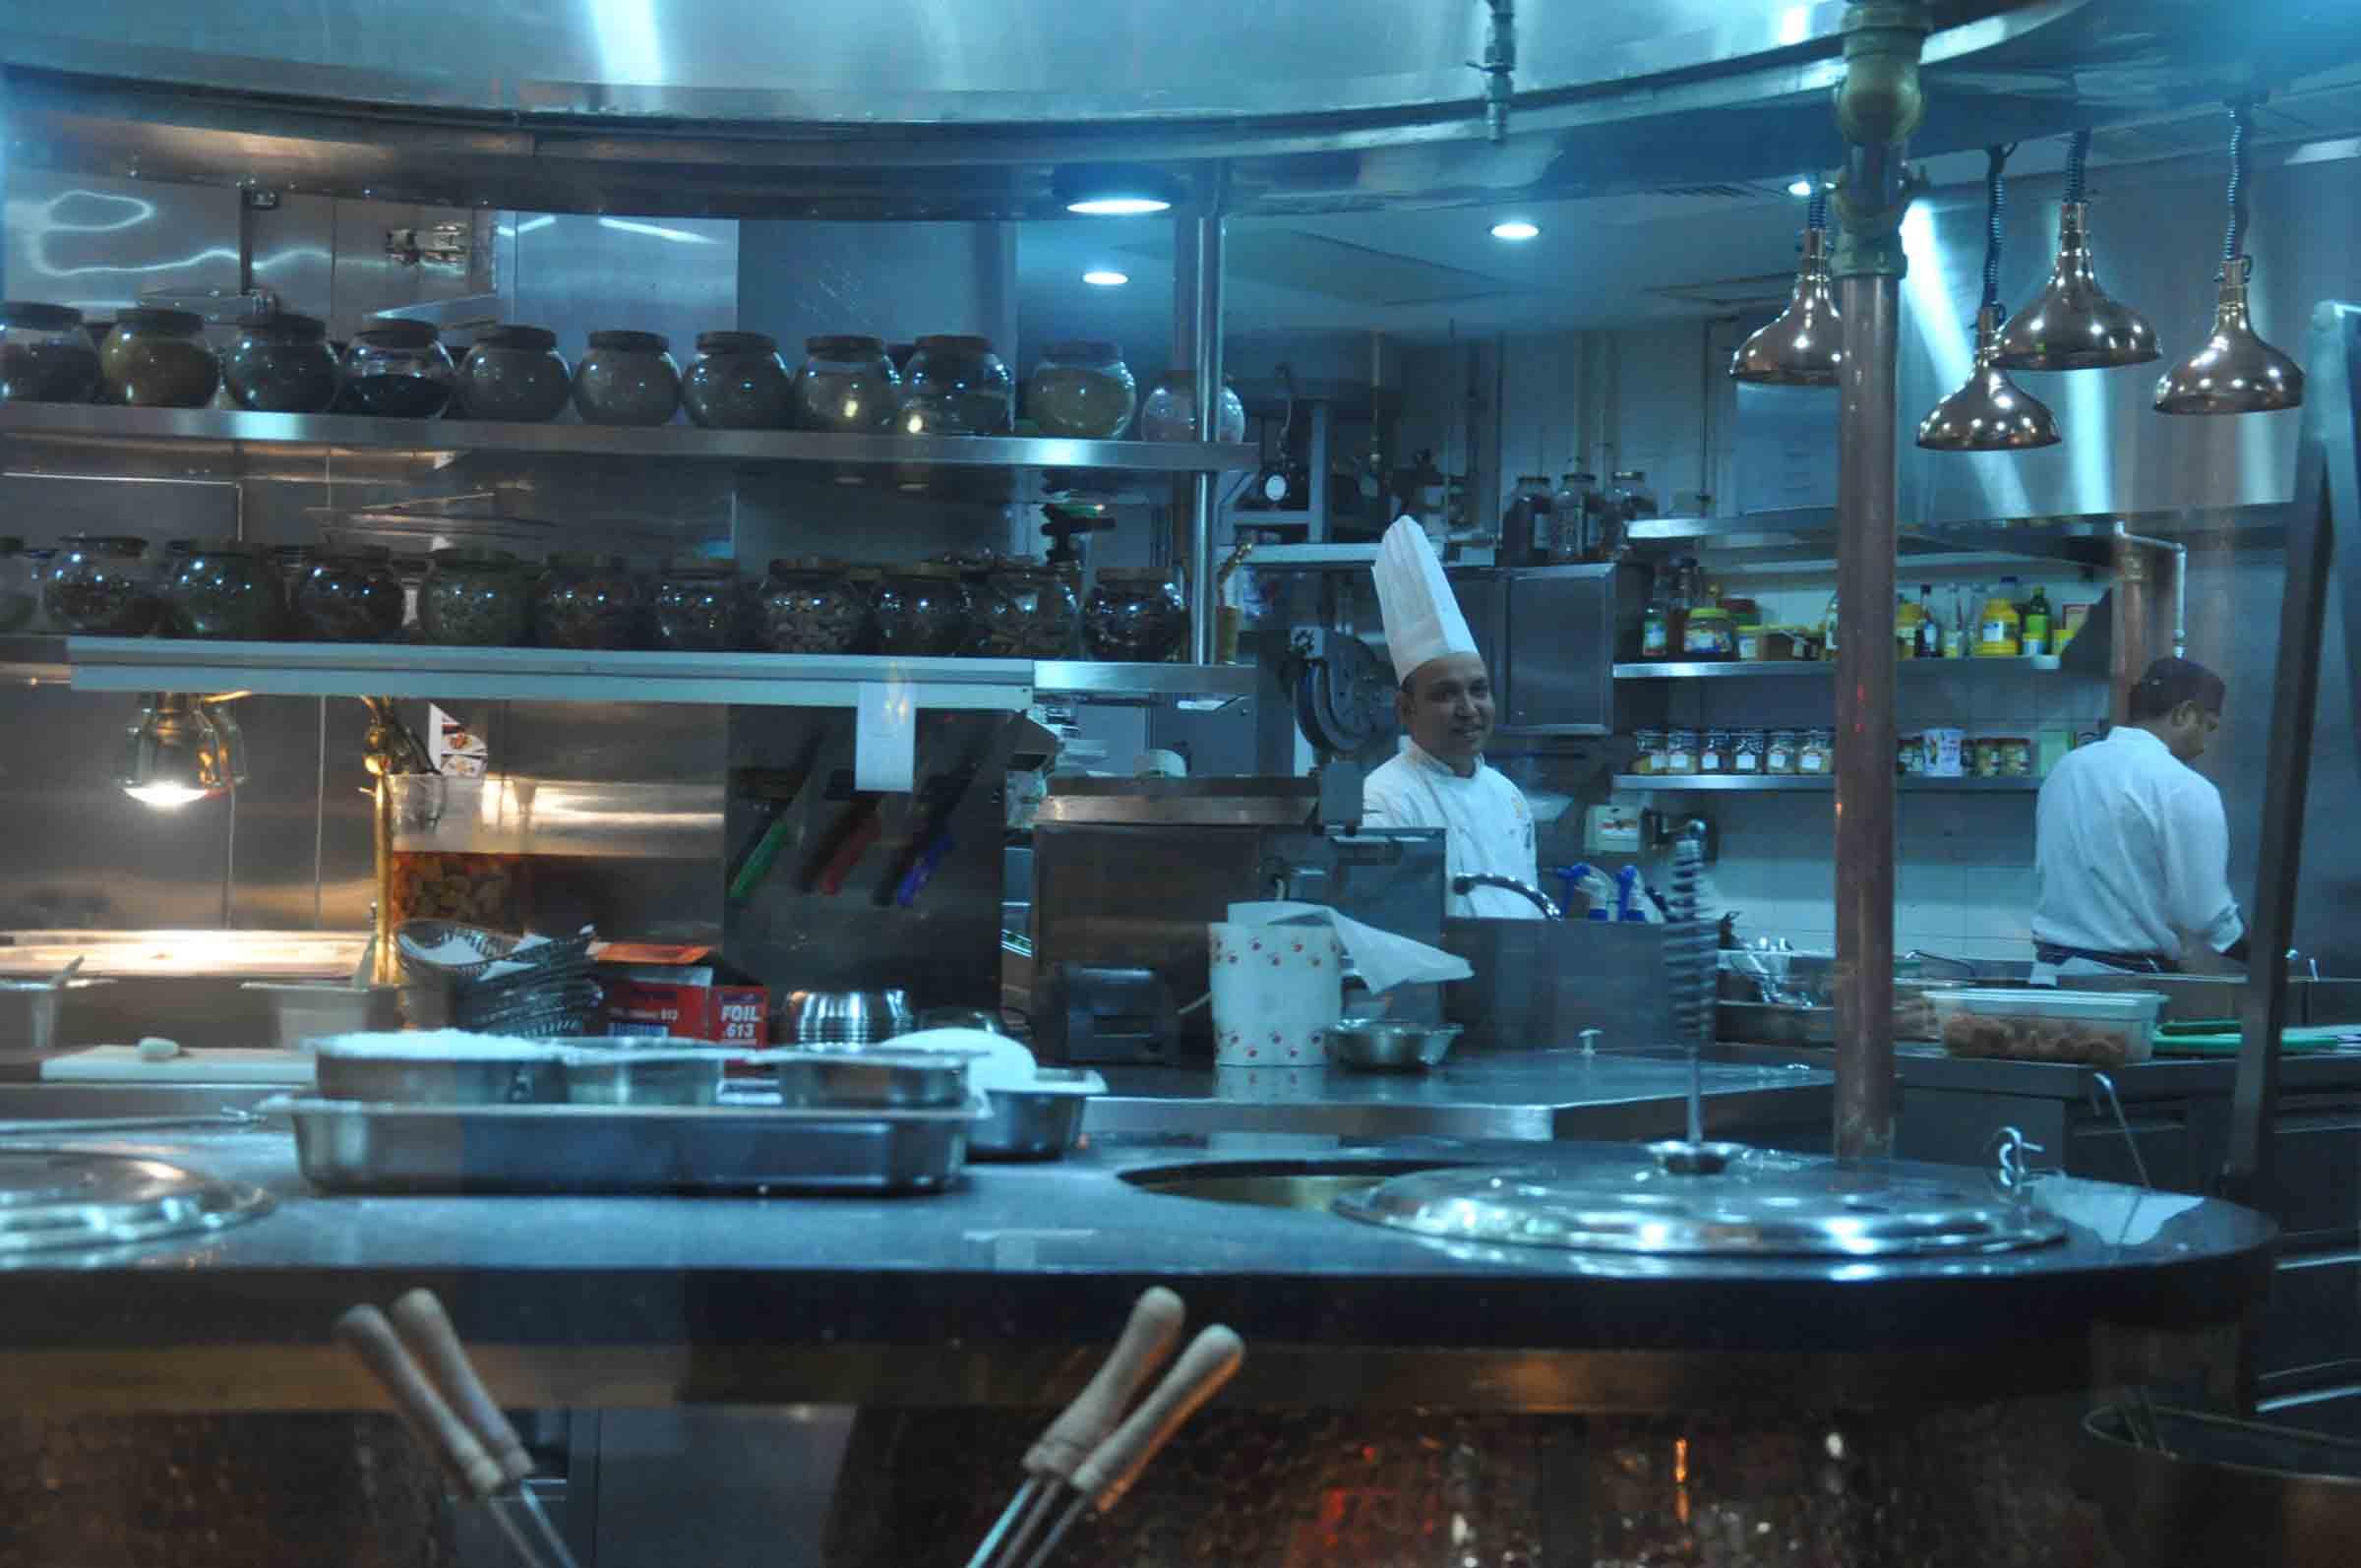 Golden Peacock Macau kitchen